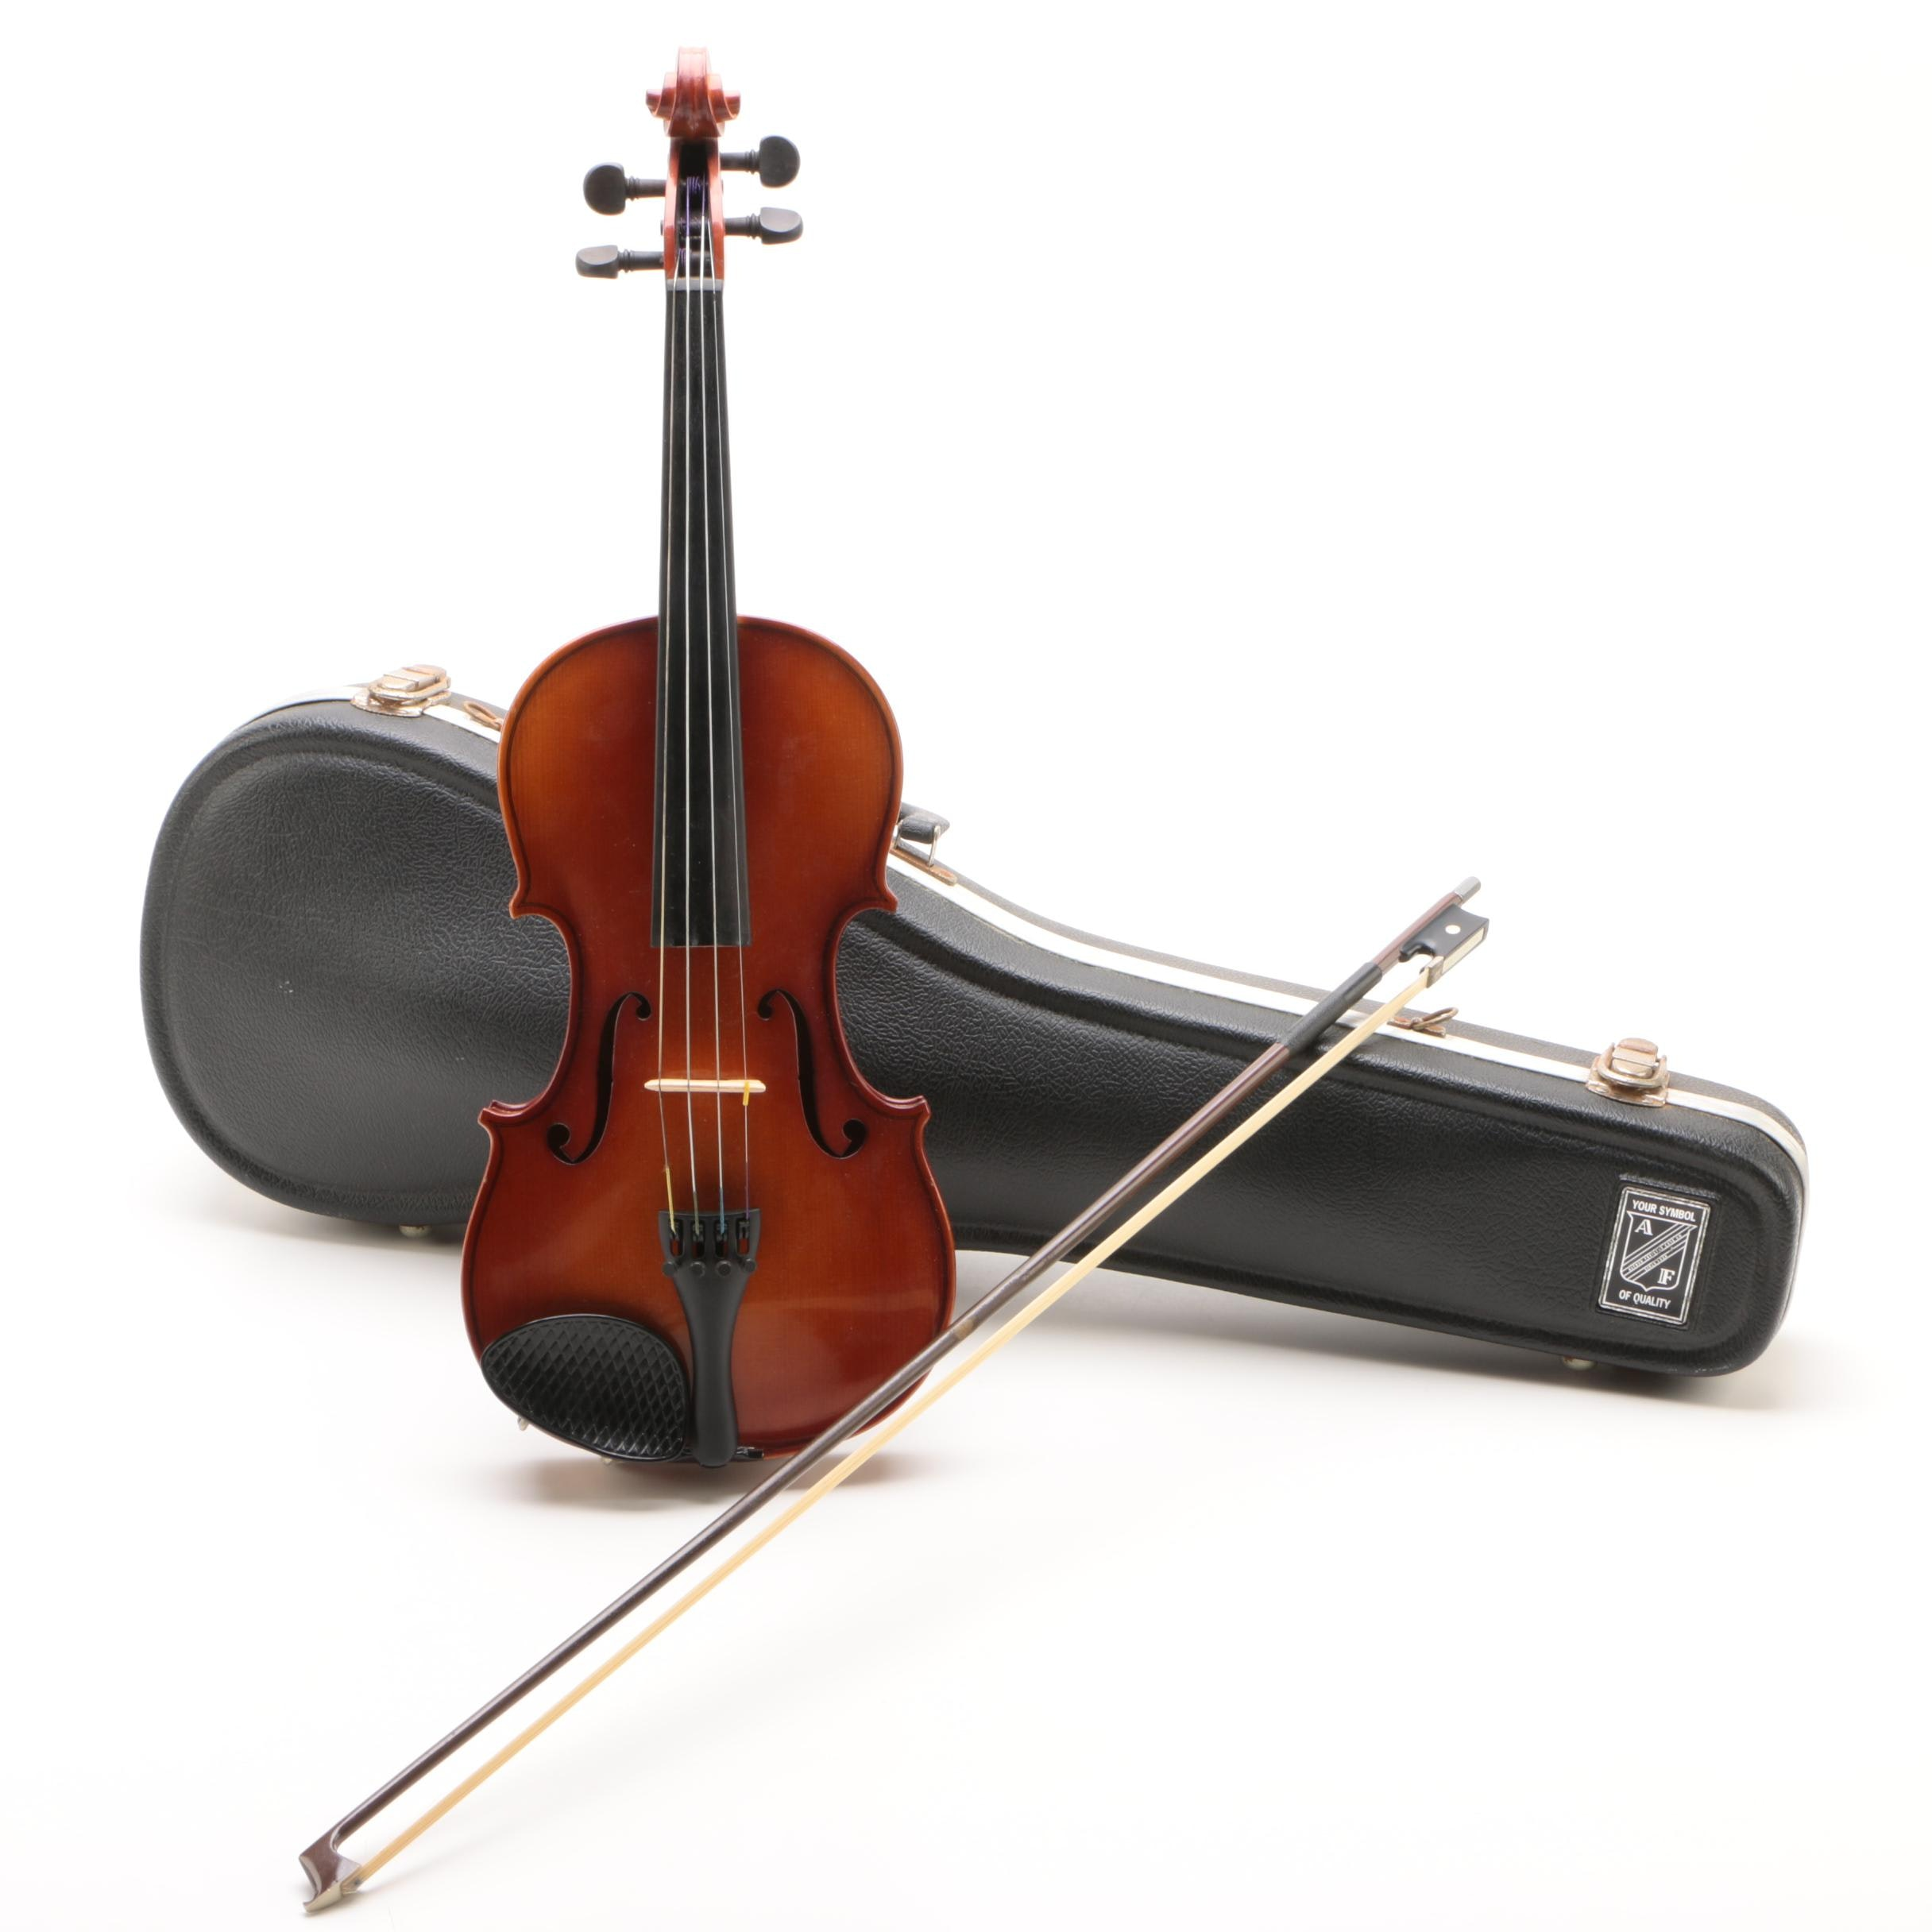 Joseph Lorenz Luby, Czechoslovakia Student Violin with Case